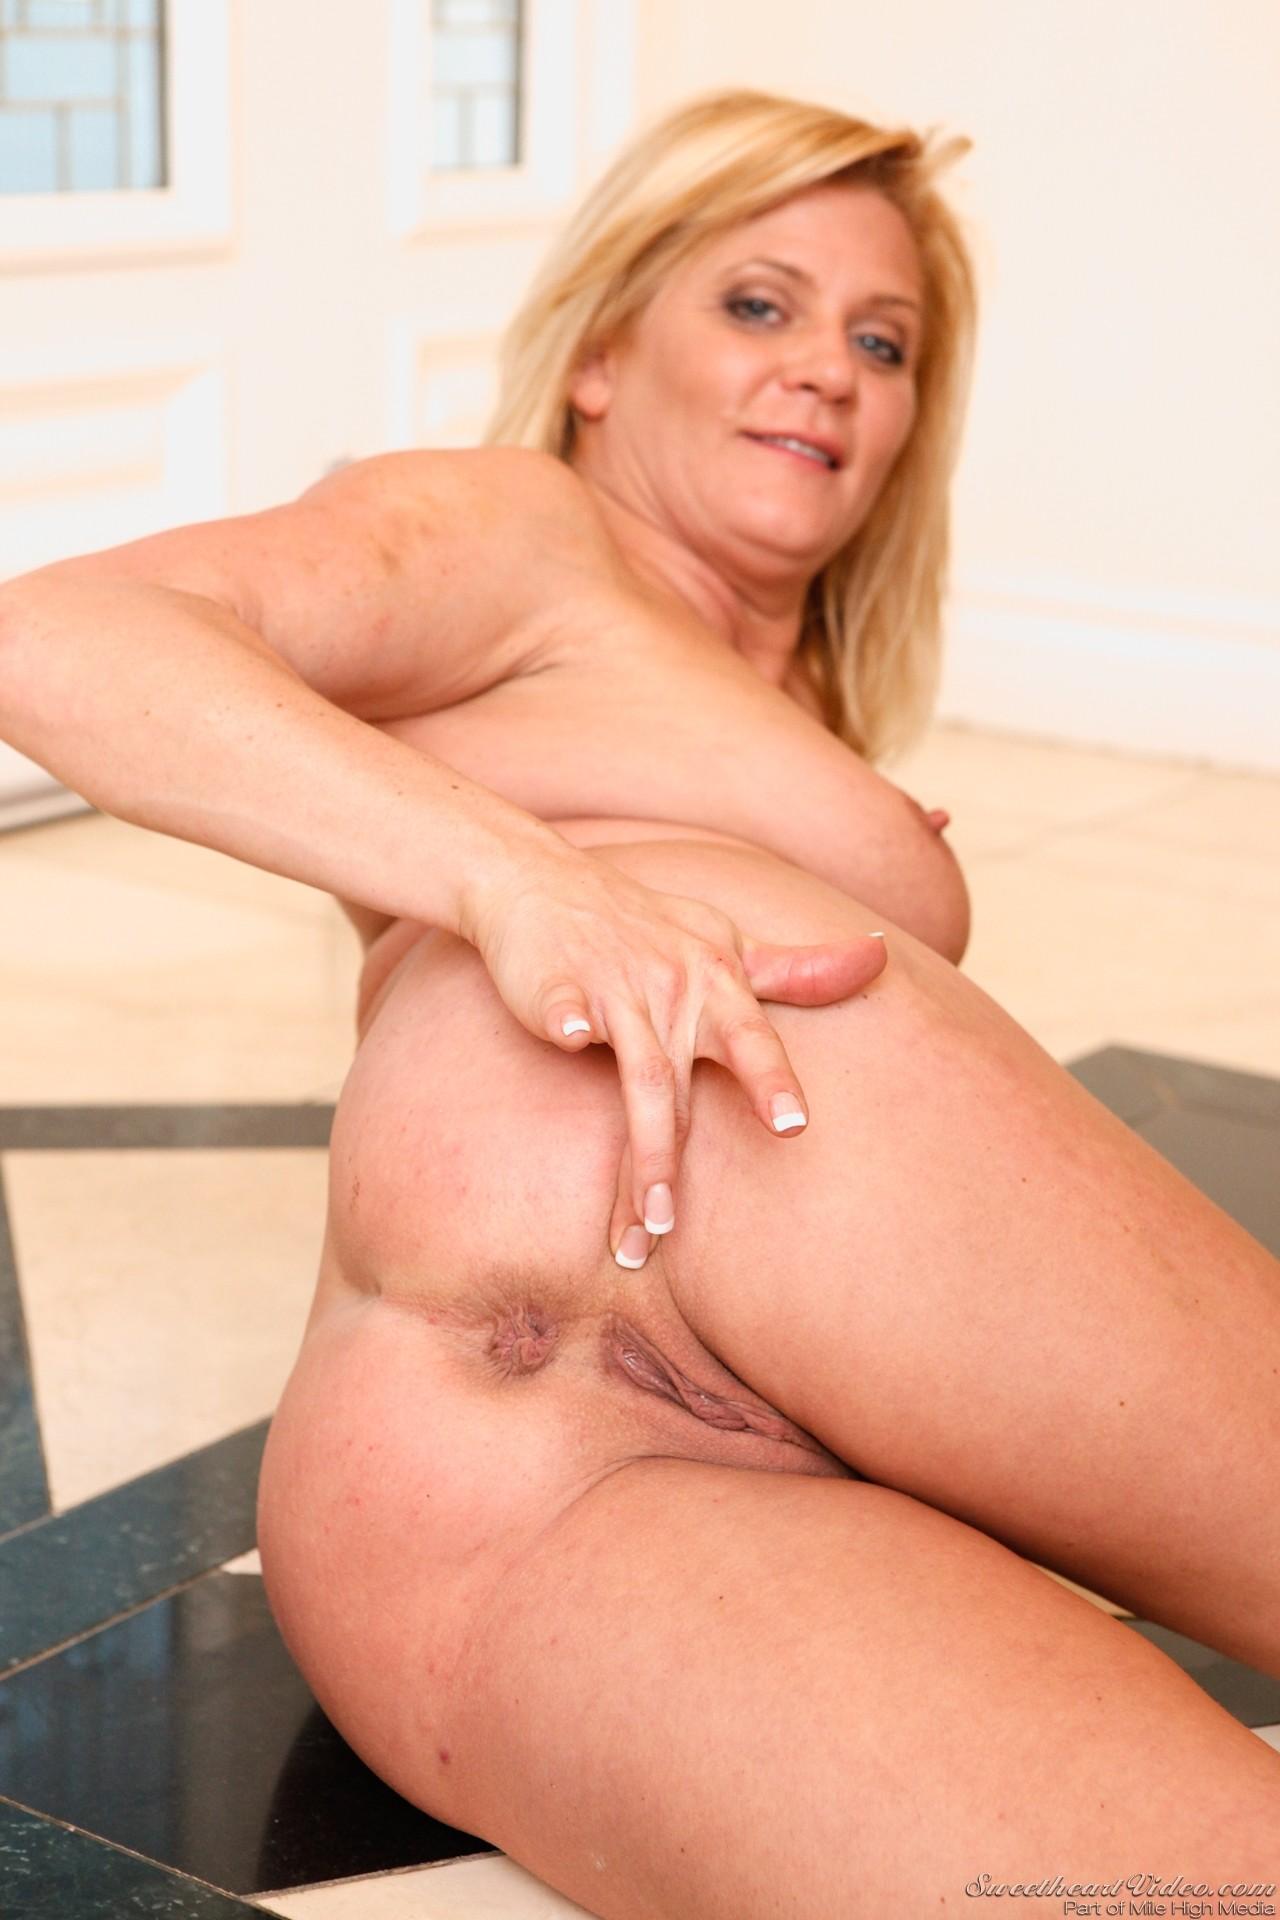 Anus mature ginger lynn sex porn